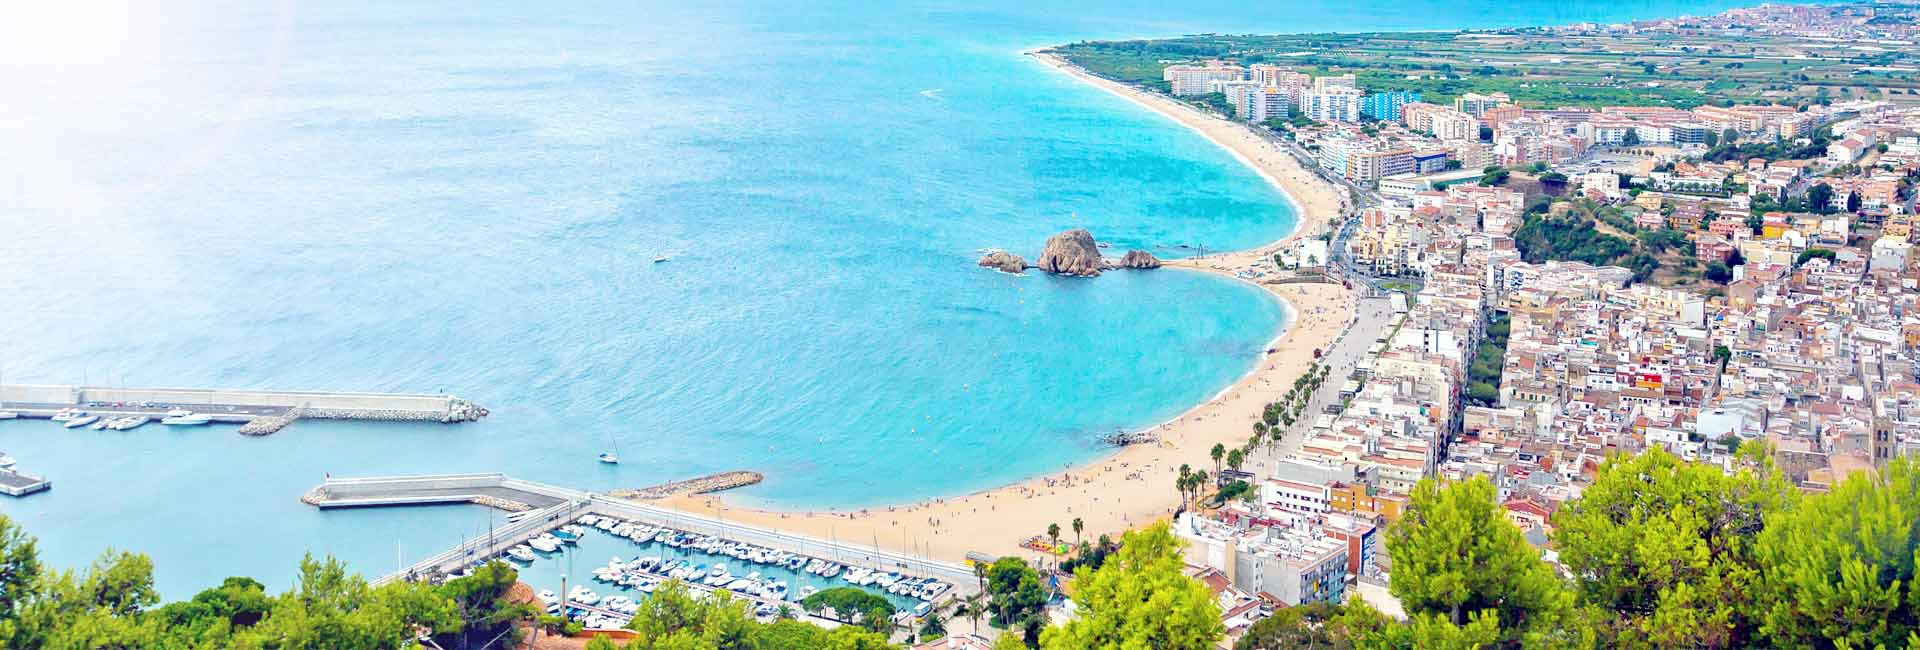 Apartments in the region/area of Costa del Sol Header Image